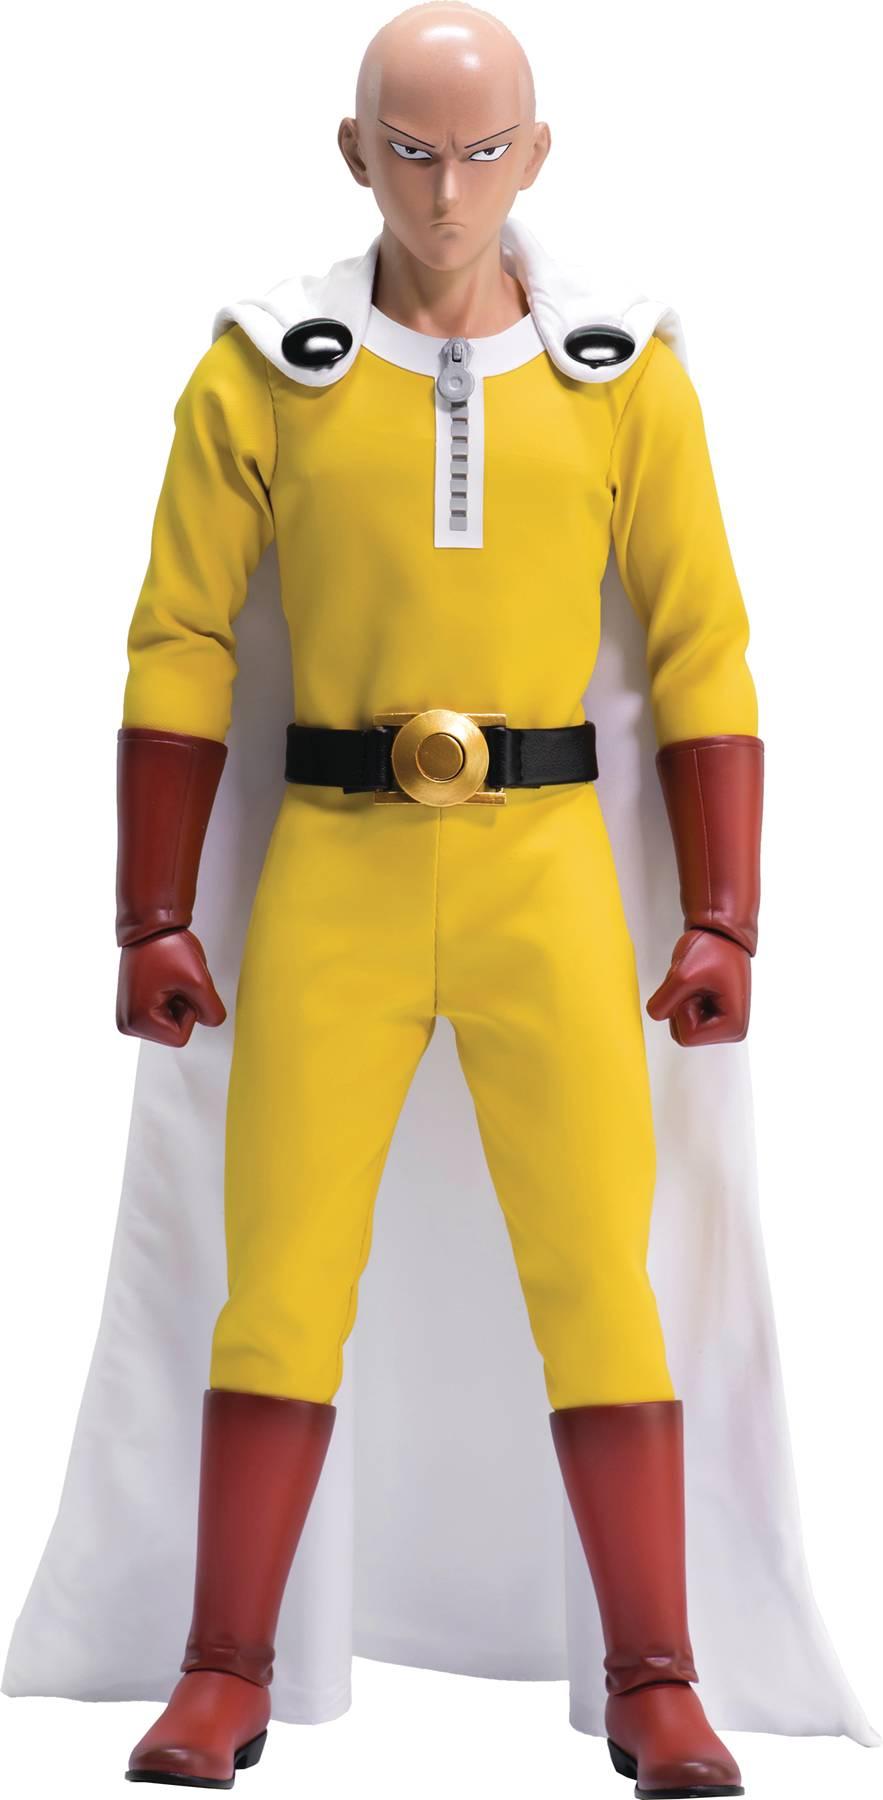 Saitama One Punch Man 1:6 Scale Action Figure By threeZero